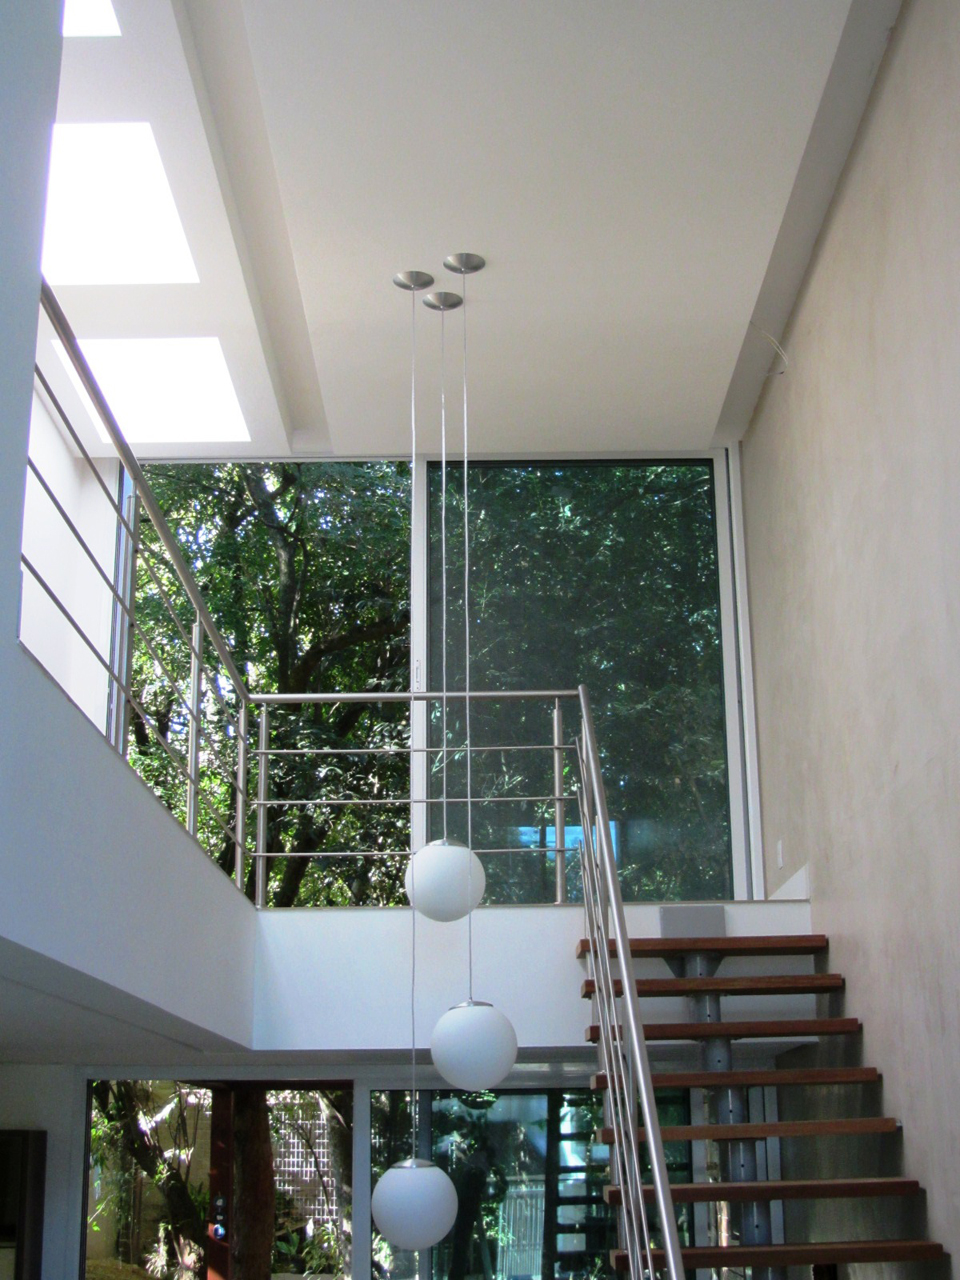 Casa Zimmermann / base2 arquitetura , Cortesia de base2arquitetura